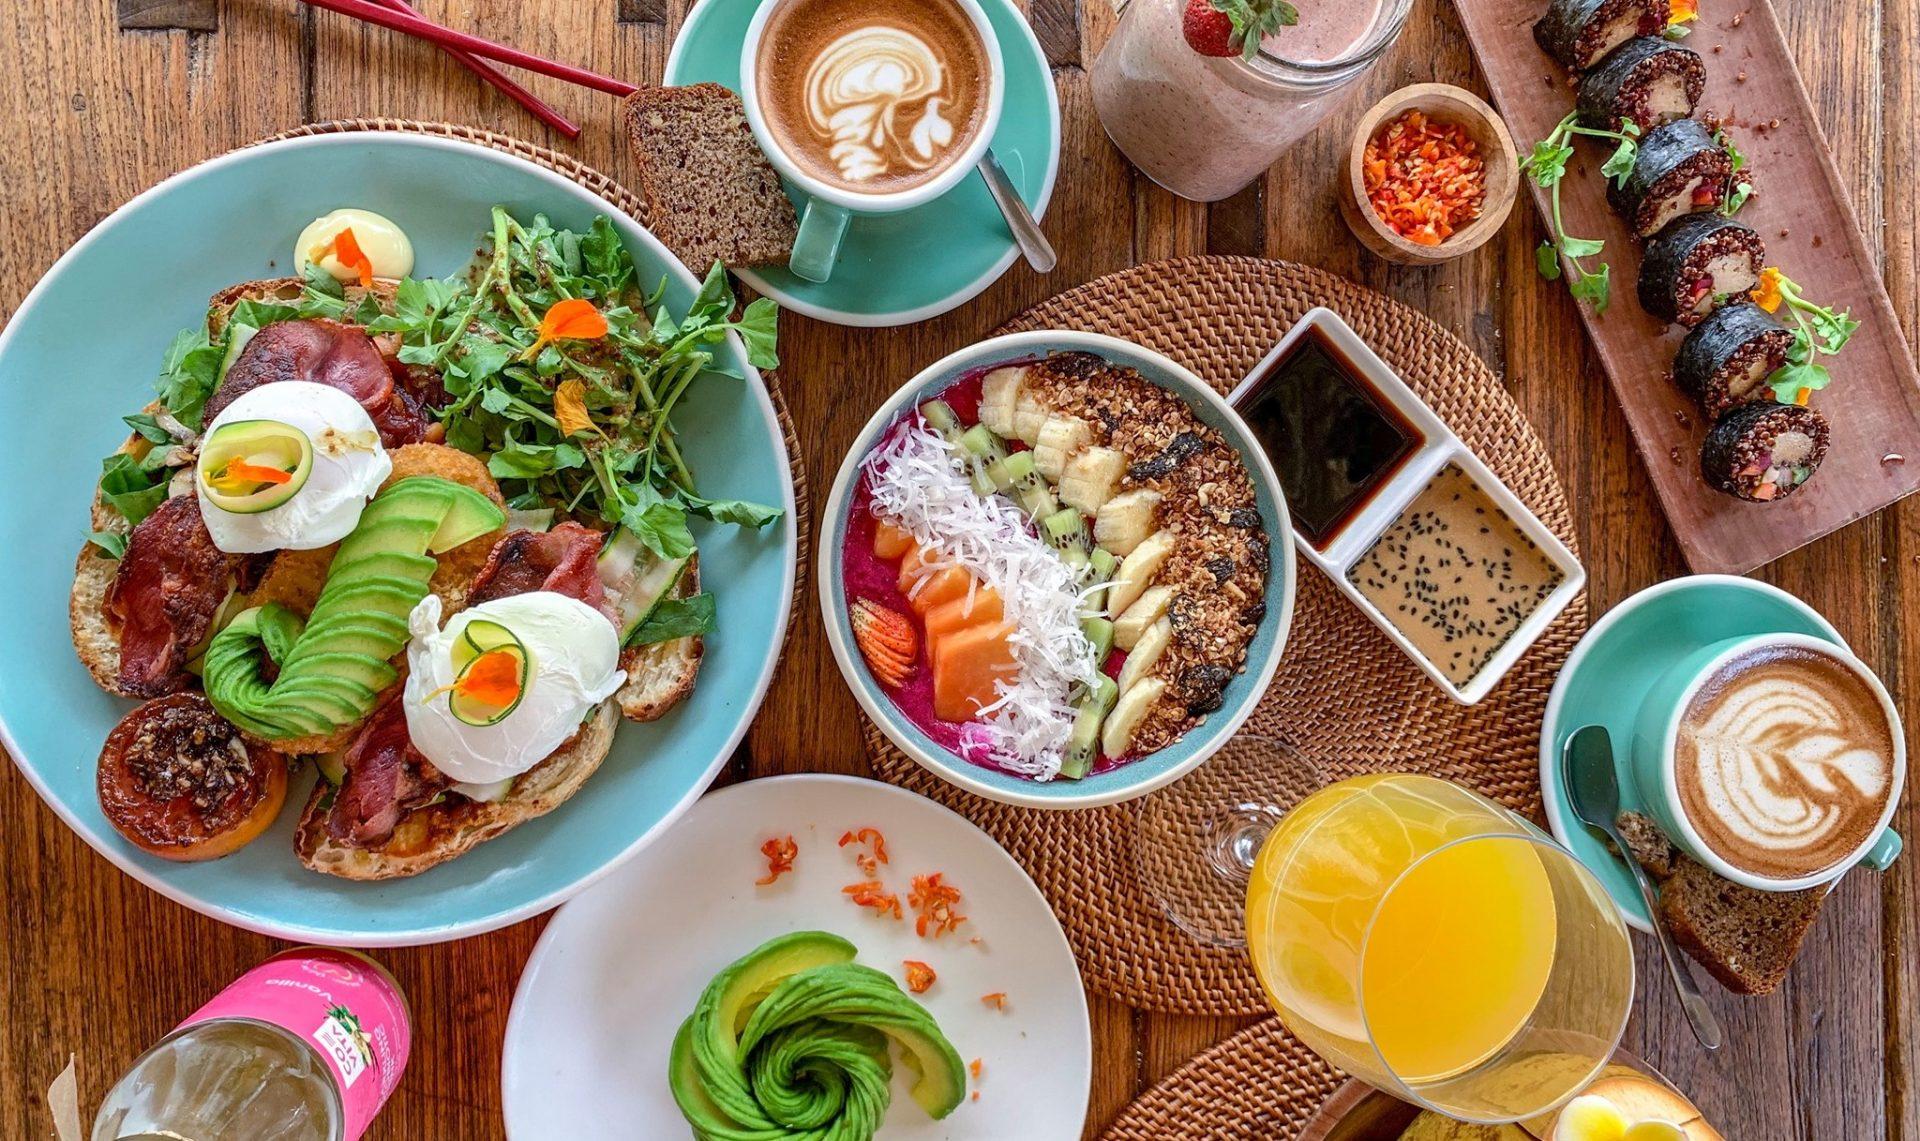 Cashew Tree Bali Vegan Vegetarian